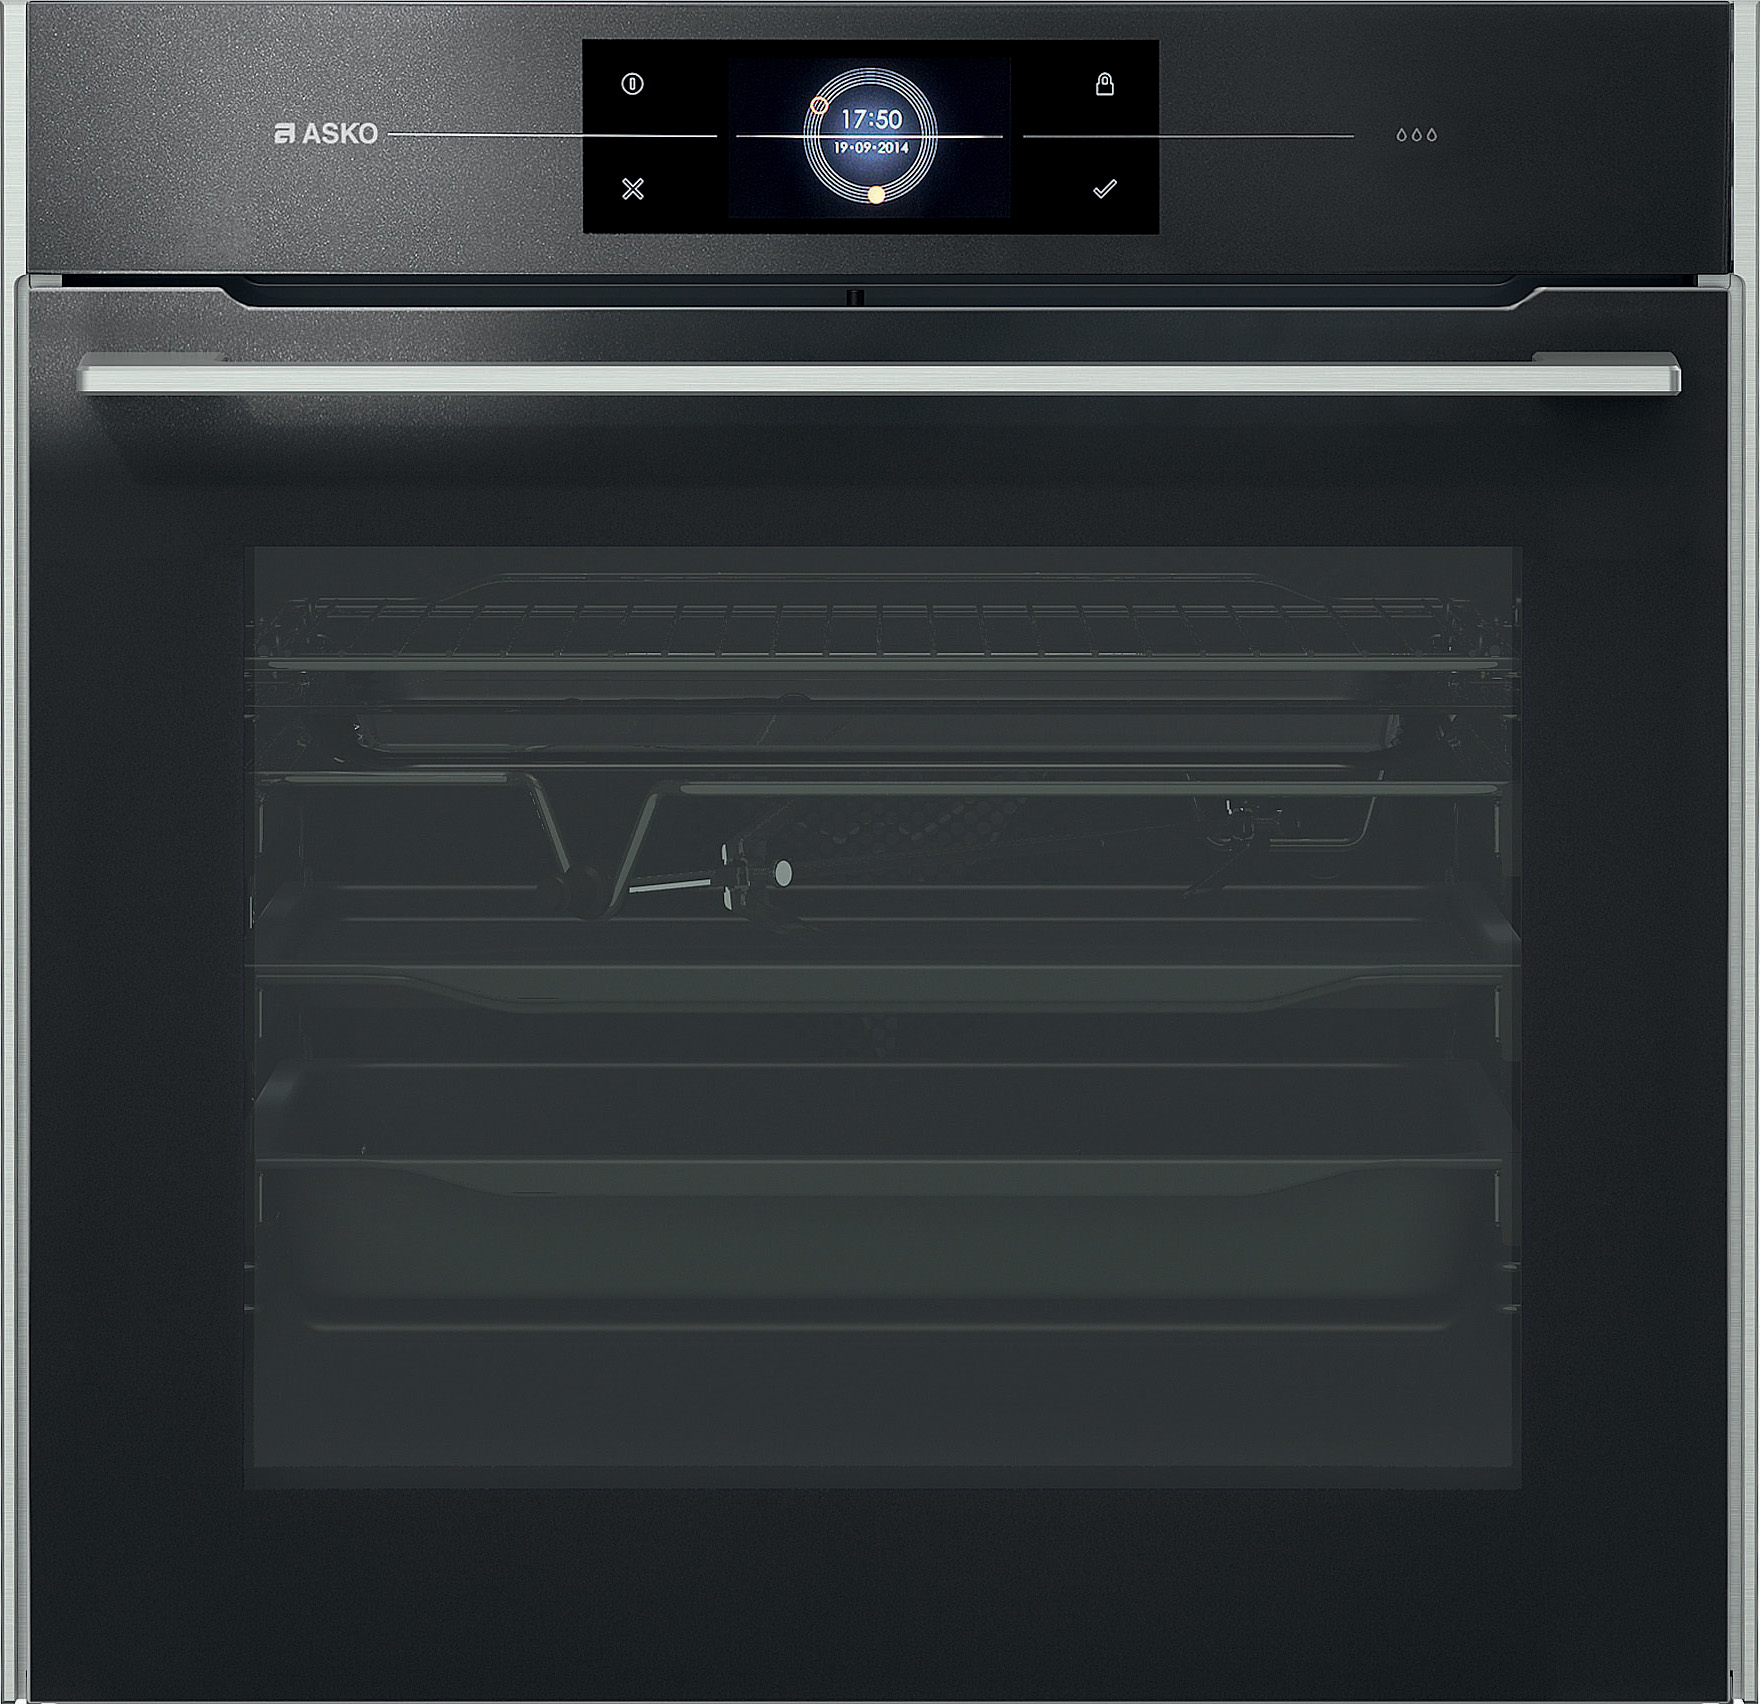 Asko Oven